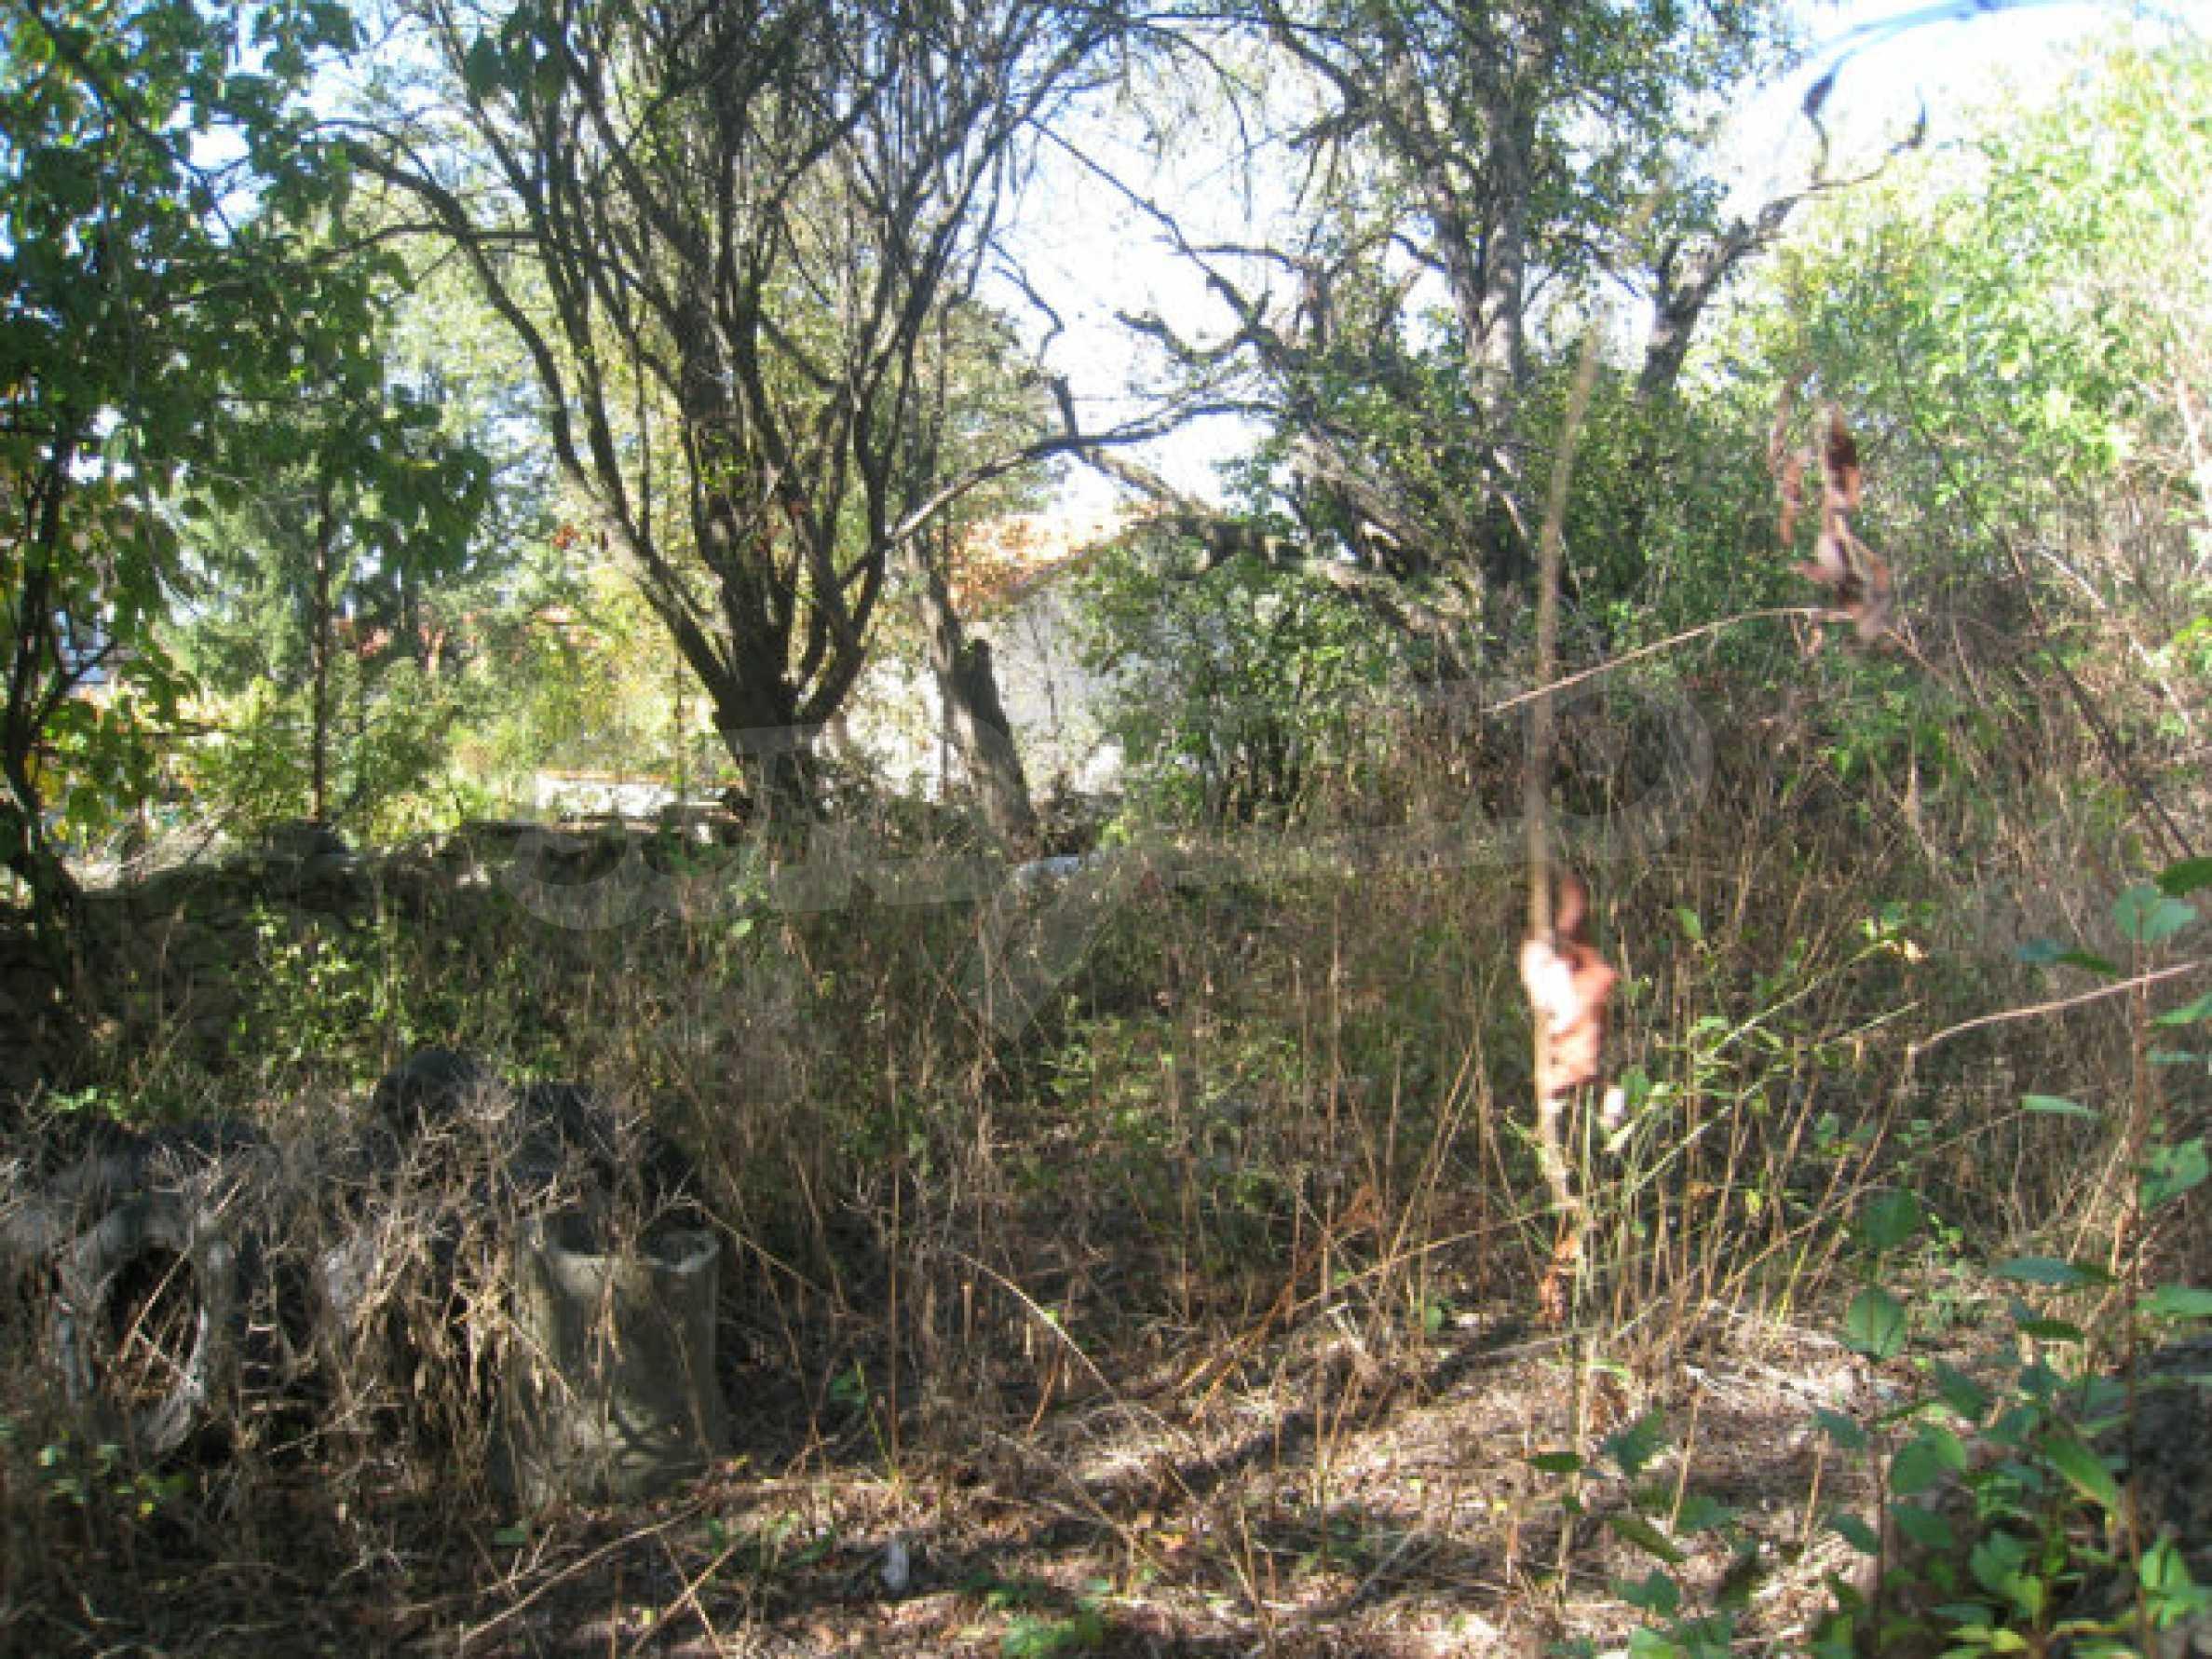 Bargain regulated plot in Ihtiman municipality near the highway and Sofia 4